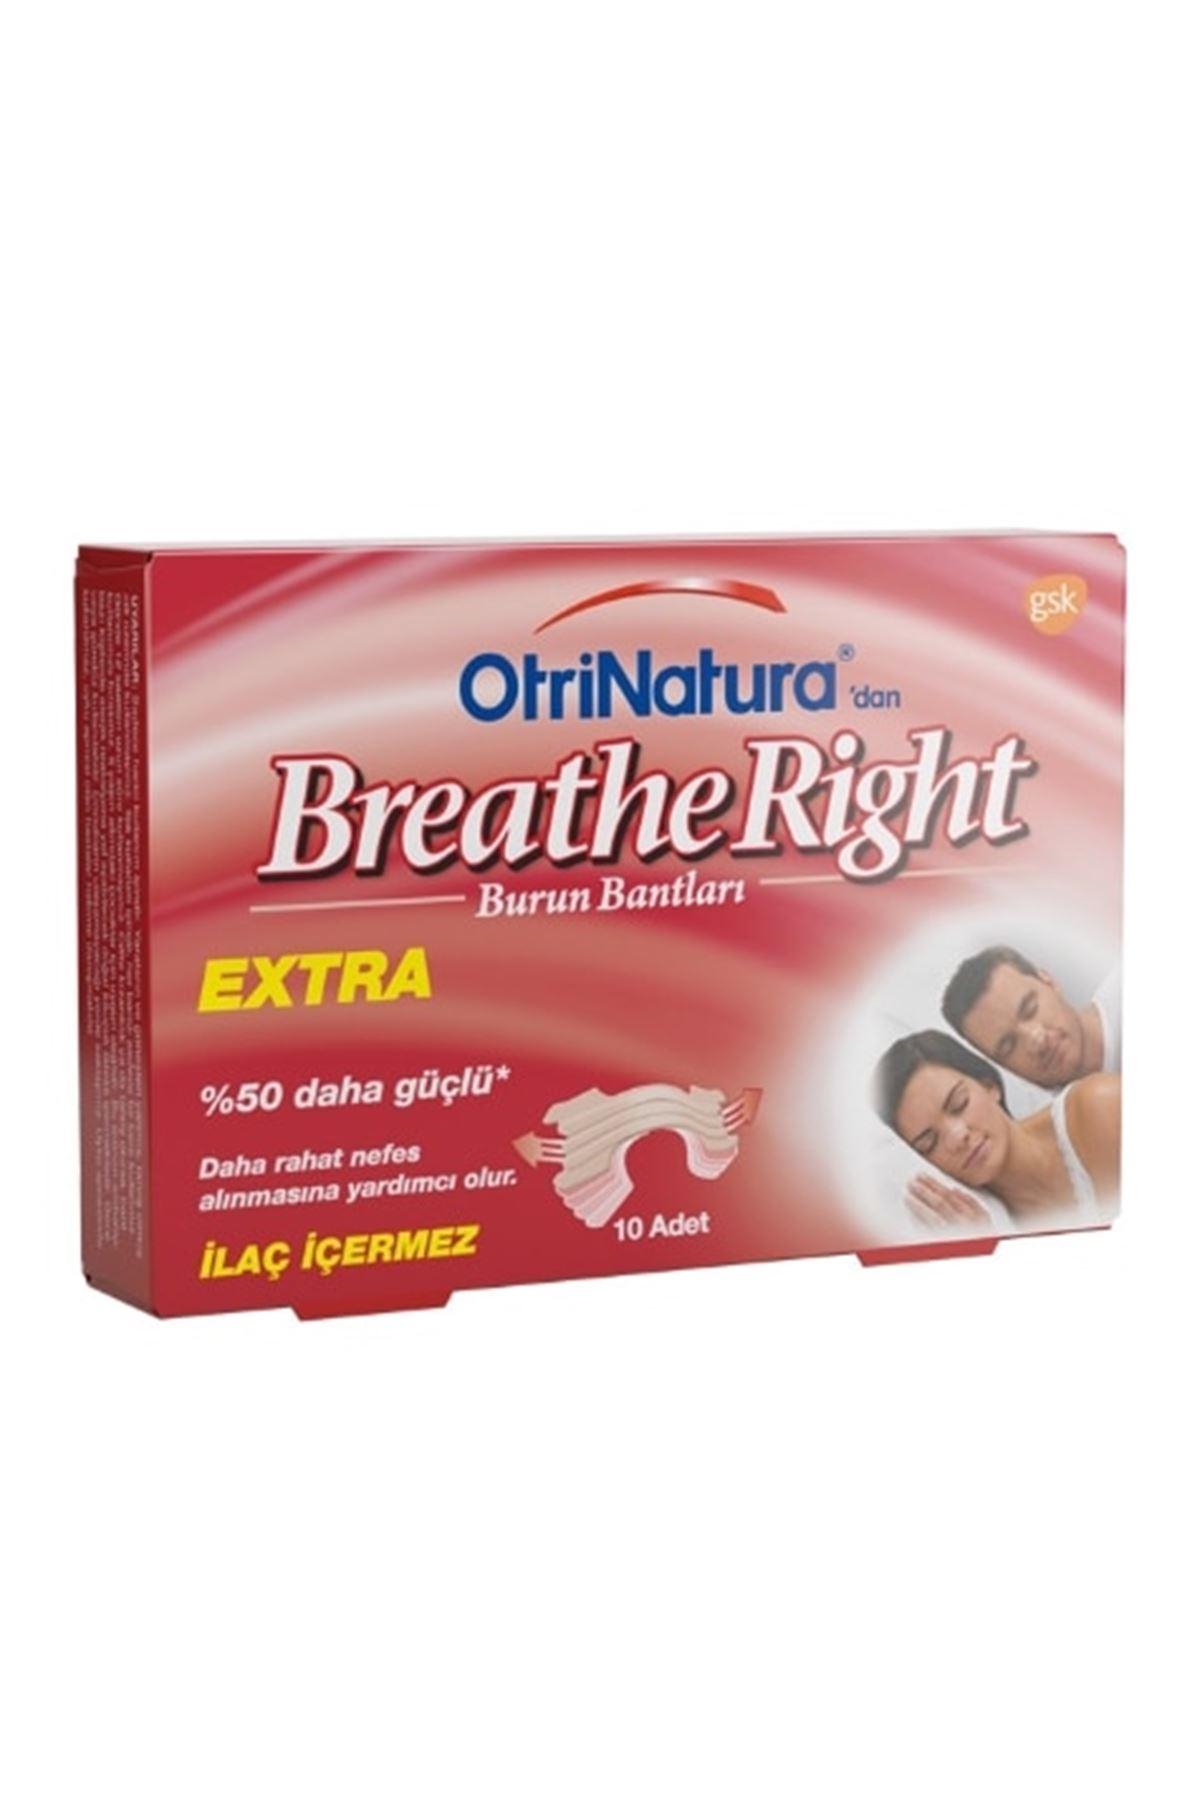 OtriNatura Breathe Right Burun Bandı Extra 10'lu